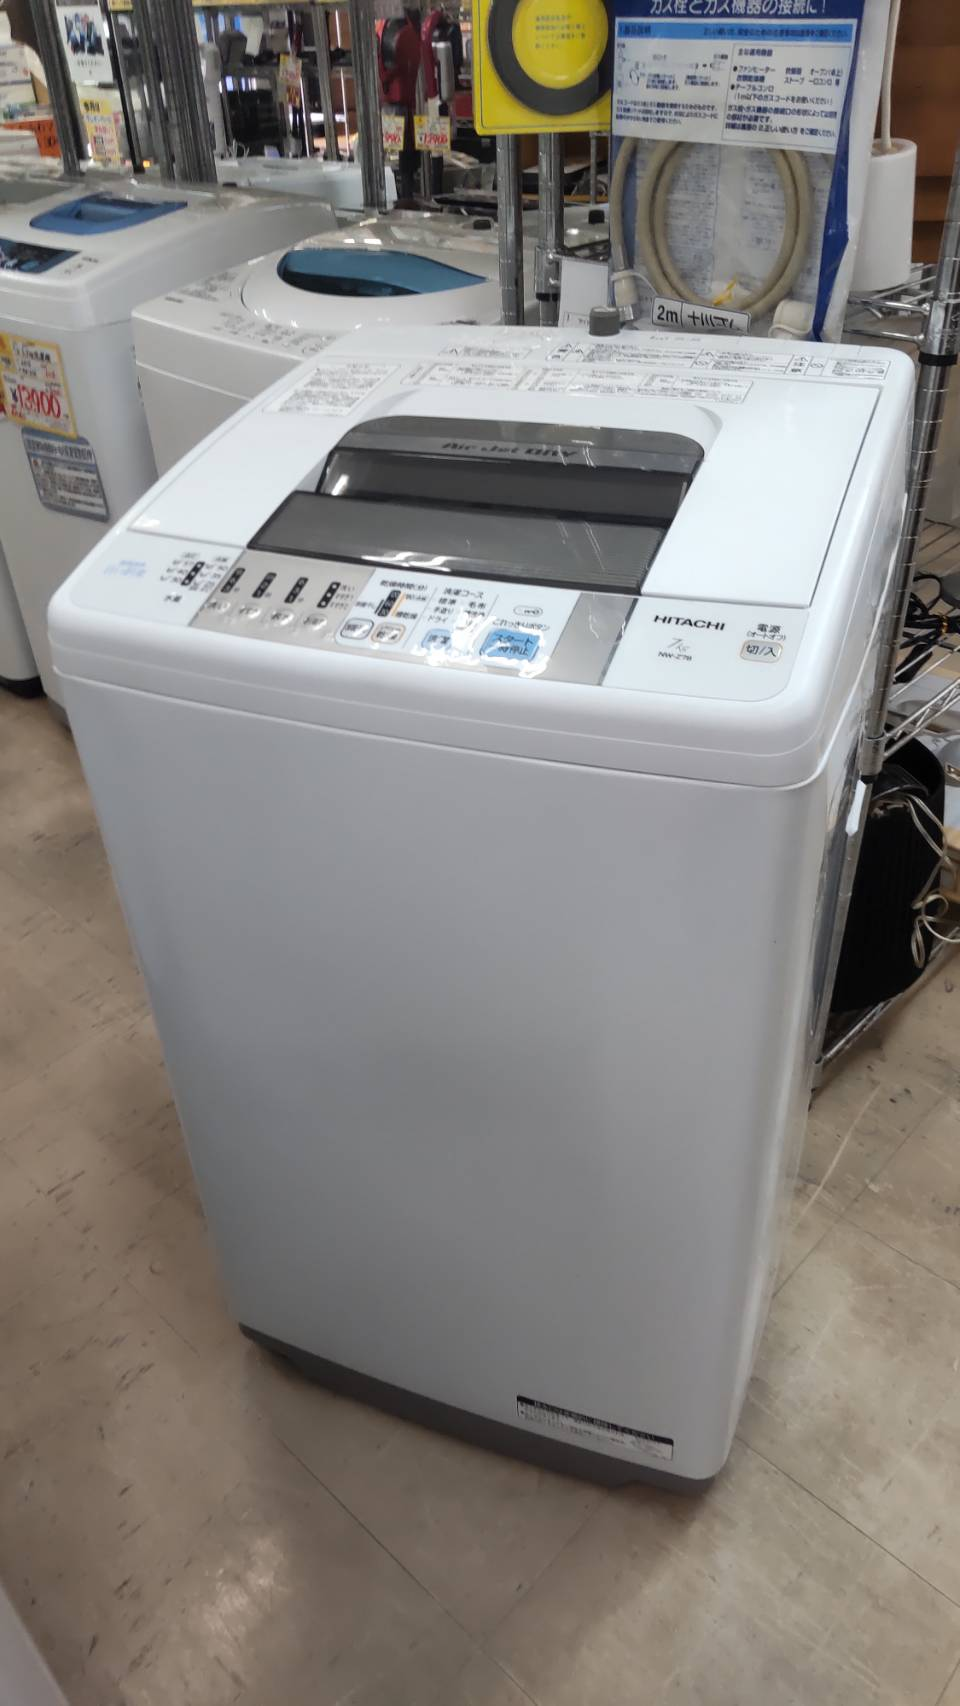 【HITACHI 日立 7.0kg 洗濯機 2015年 NW-Z78 白い約束 シャワー浸透洗浄 エアジェット乾燥♪】を買取させて頂きました!の買取-